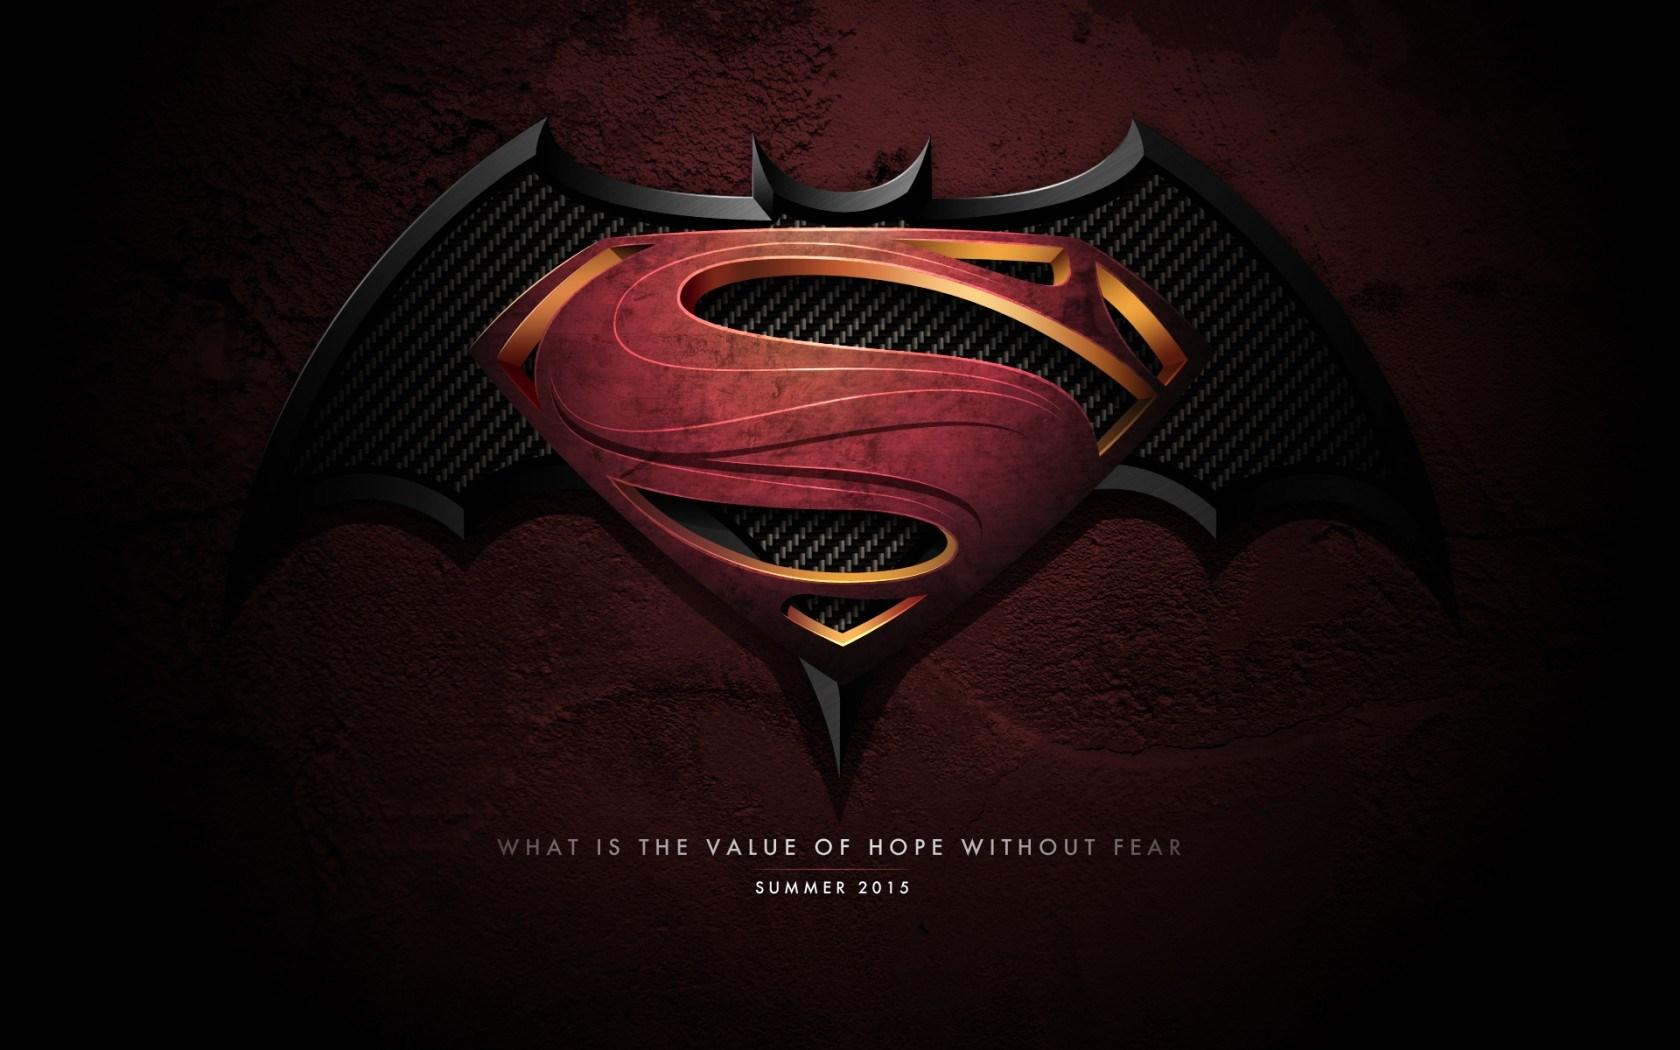 Batman VS Superman Logo Movies Wallpaper HD Wallpaper with 1680x1050 1680x1050